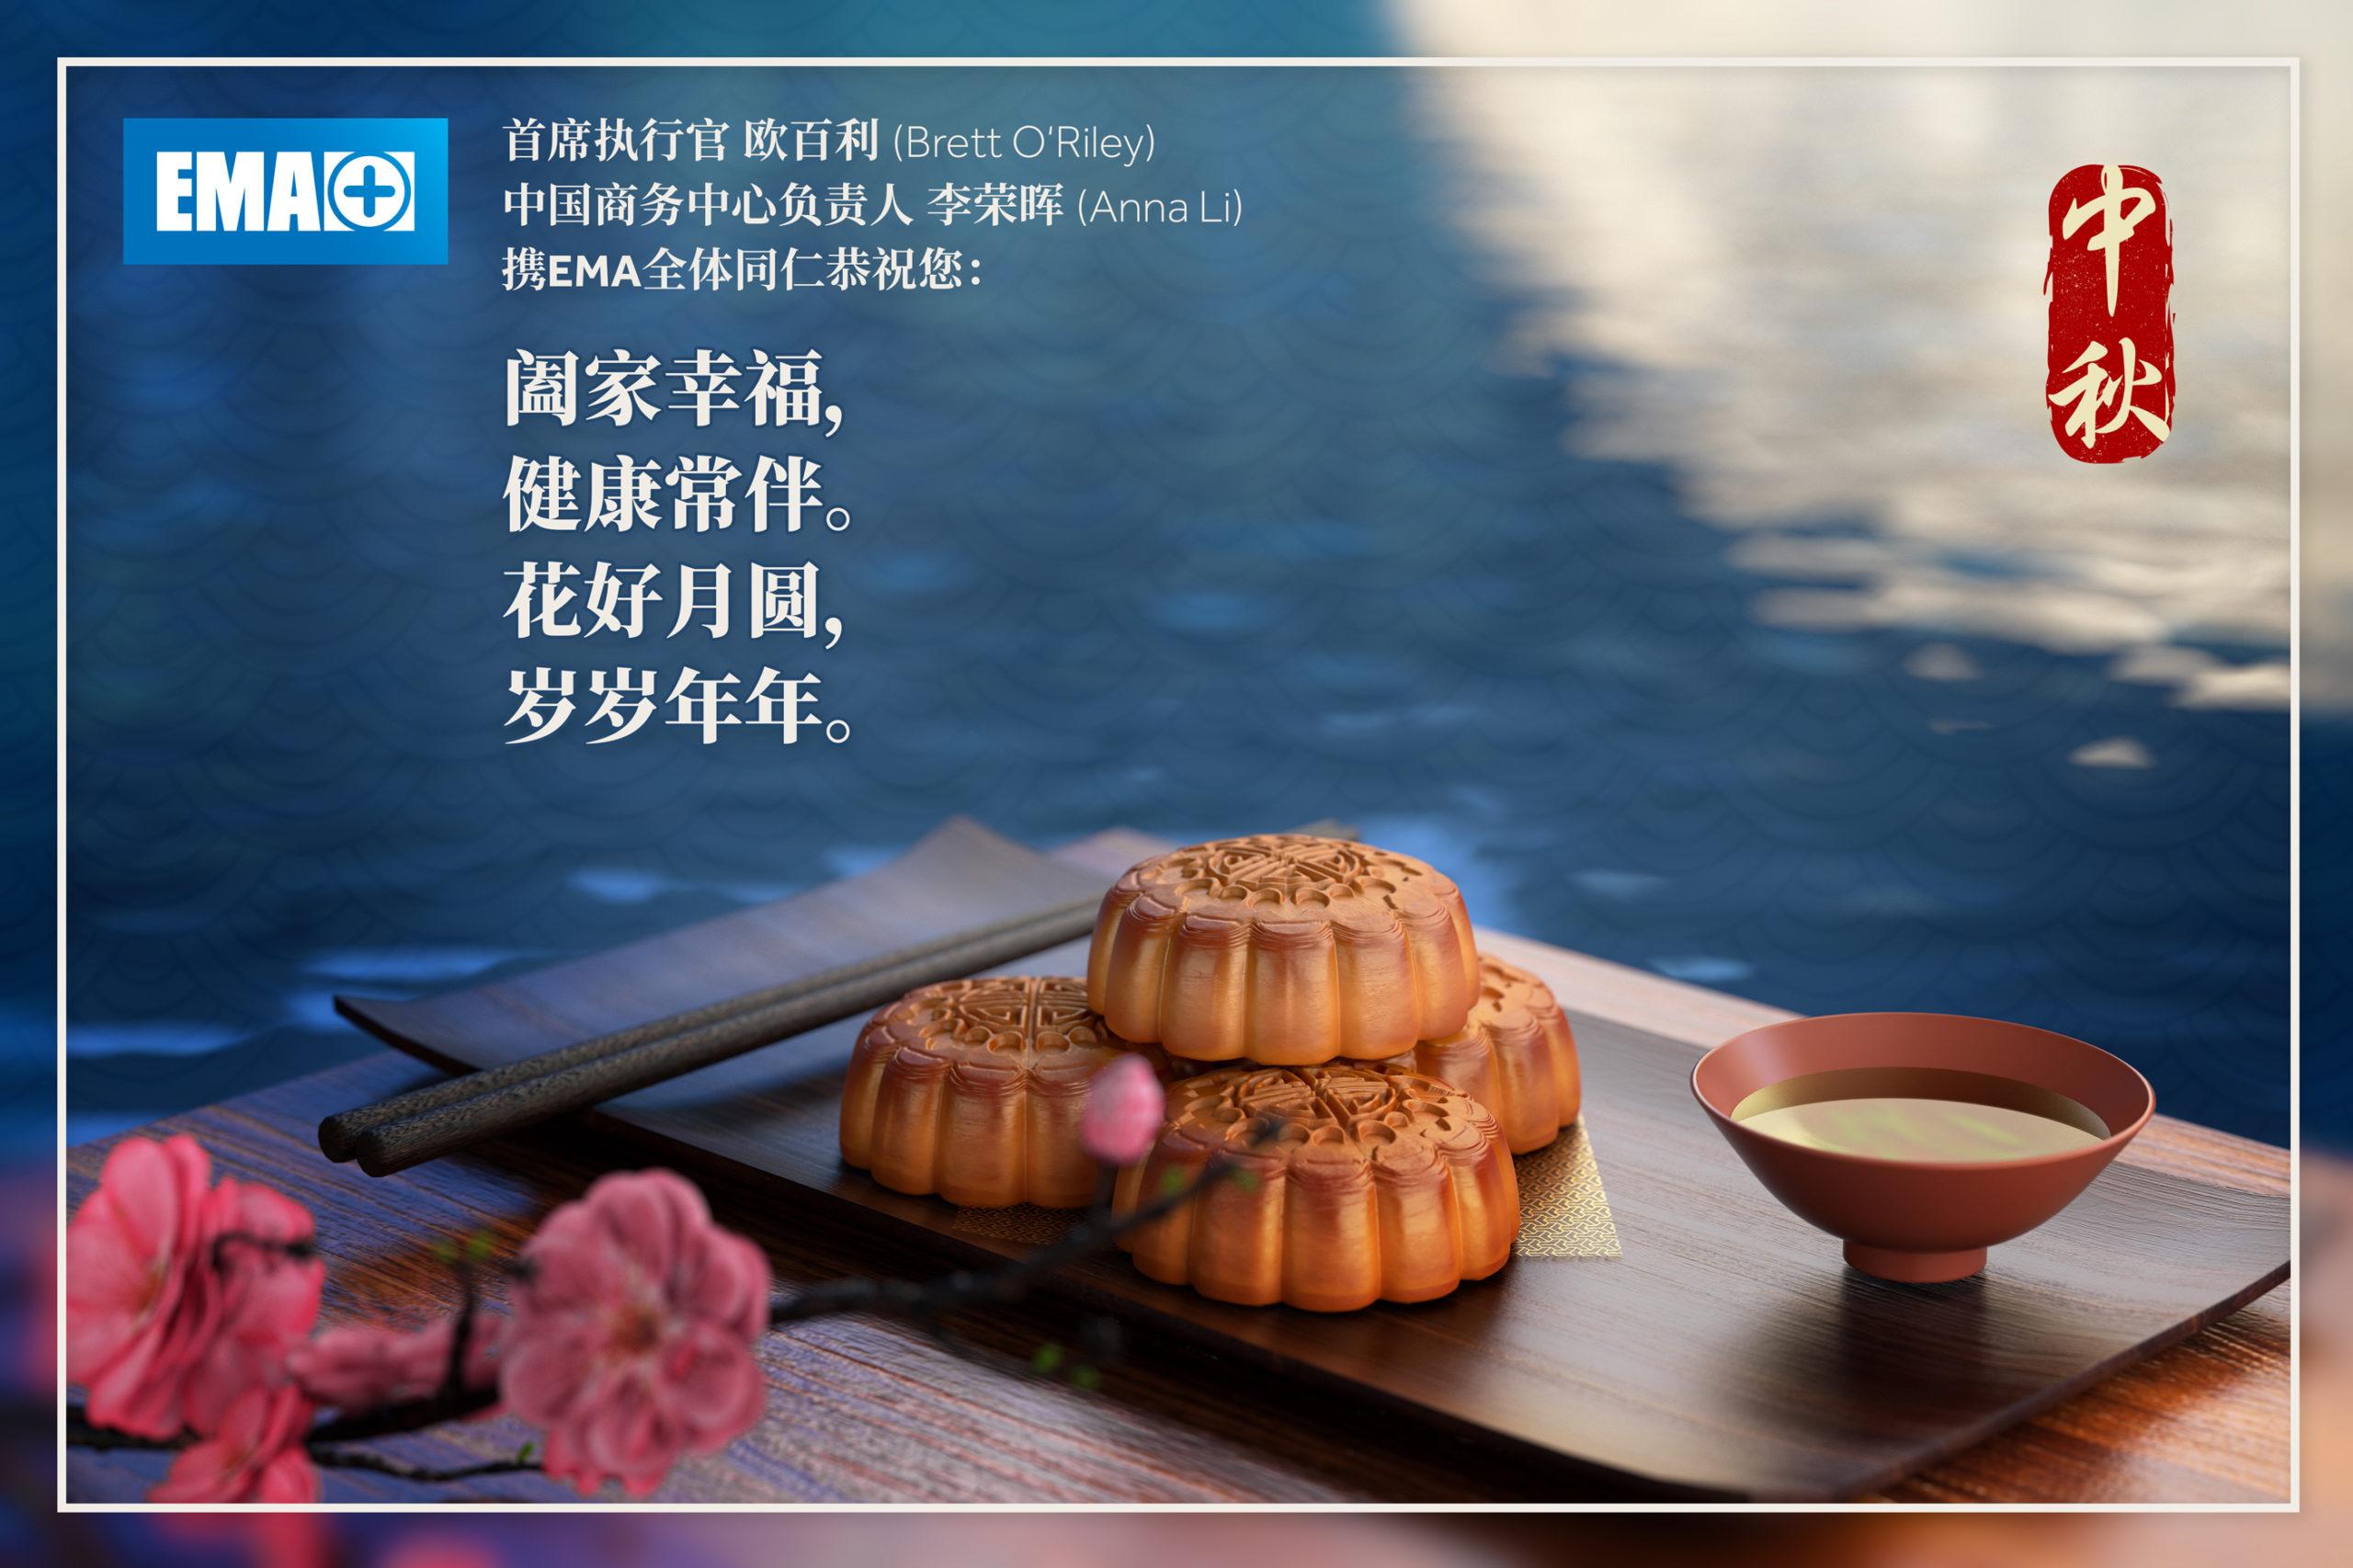 Moon Festival Promo - 2020 Mid Autumn Festival scaled